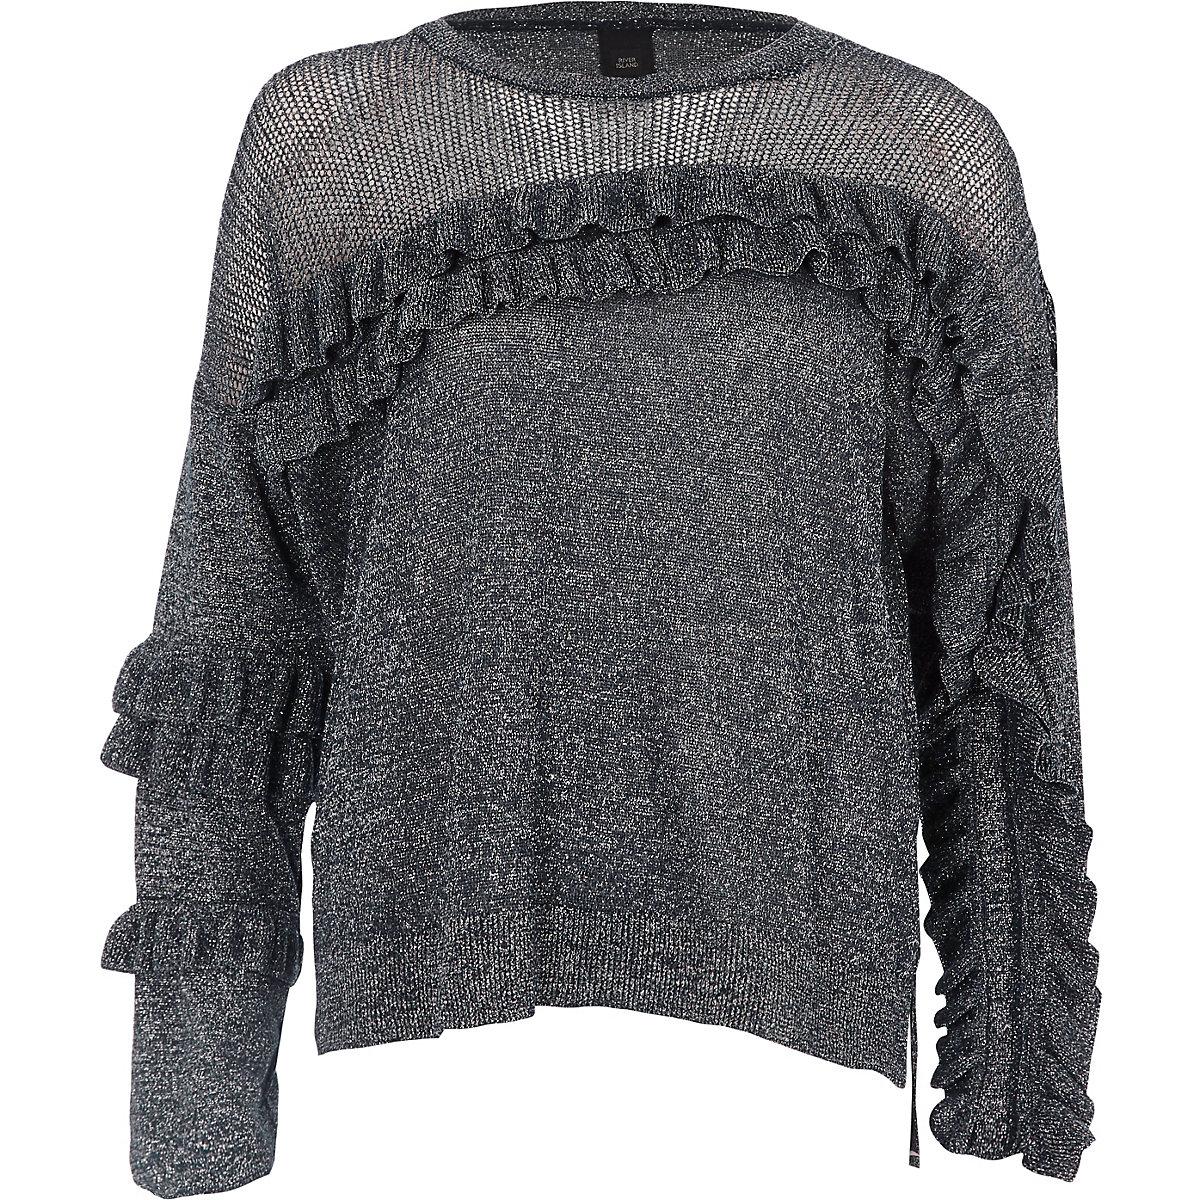 Dark silver metallic knit frill front sweater